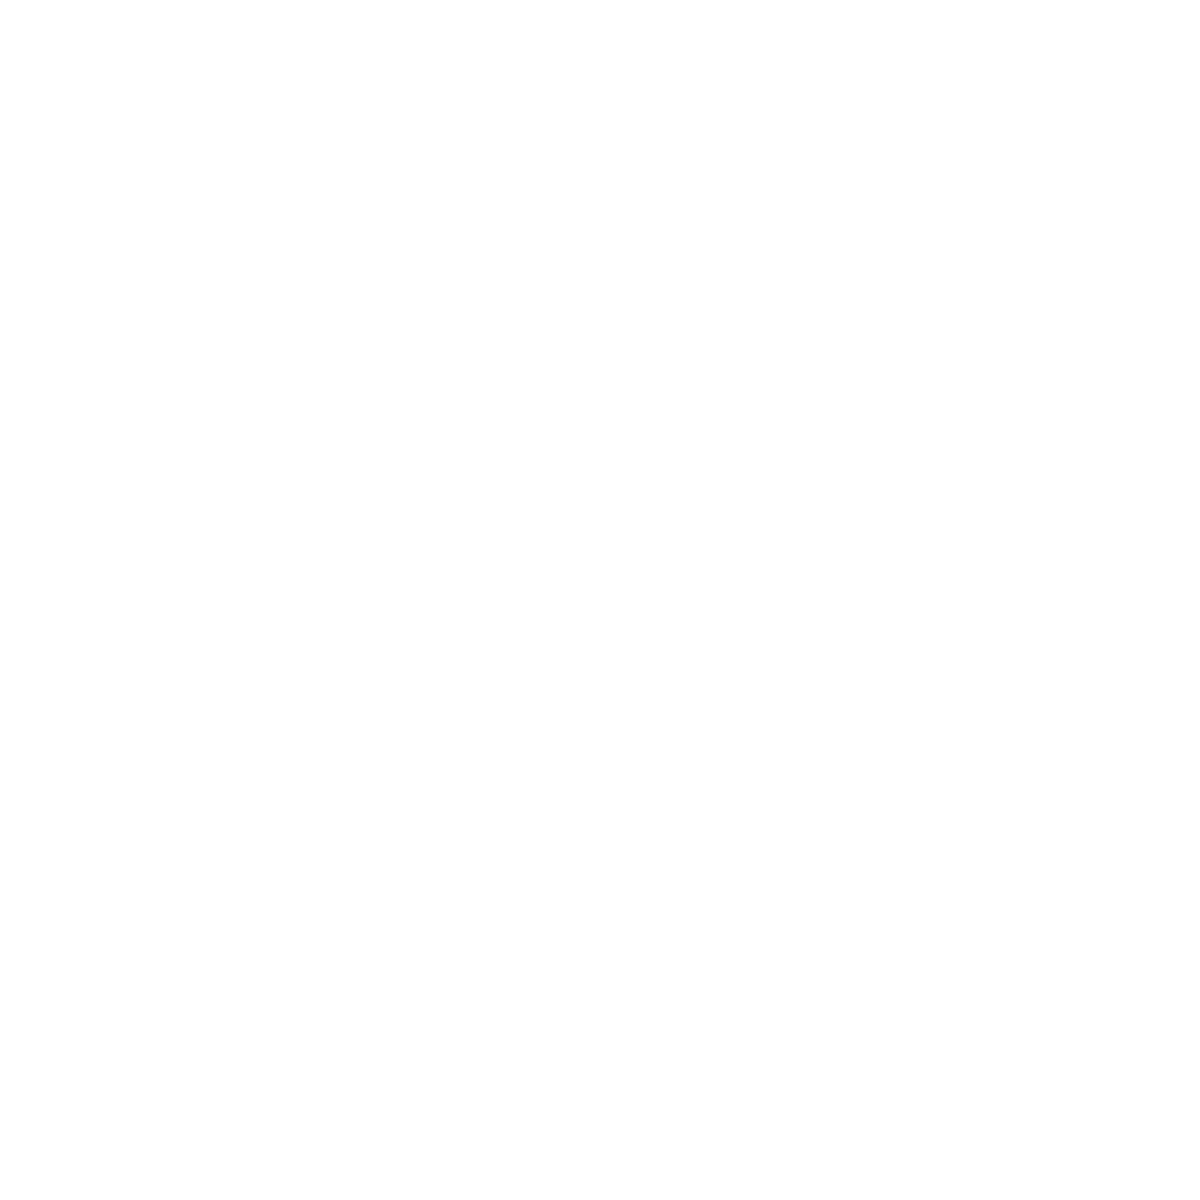 LakeShoreLogo